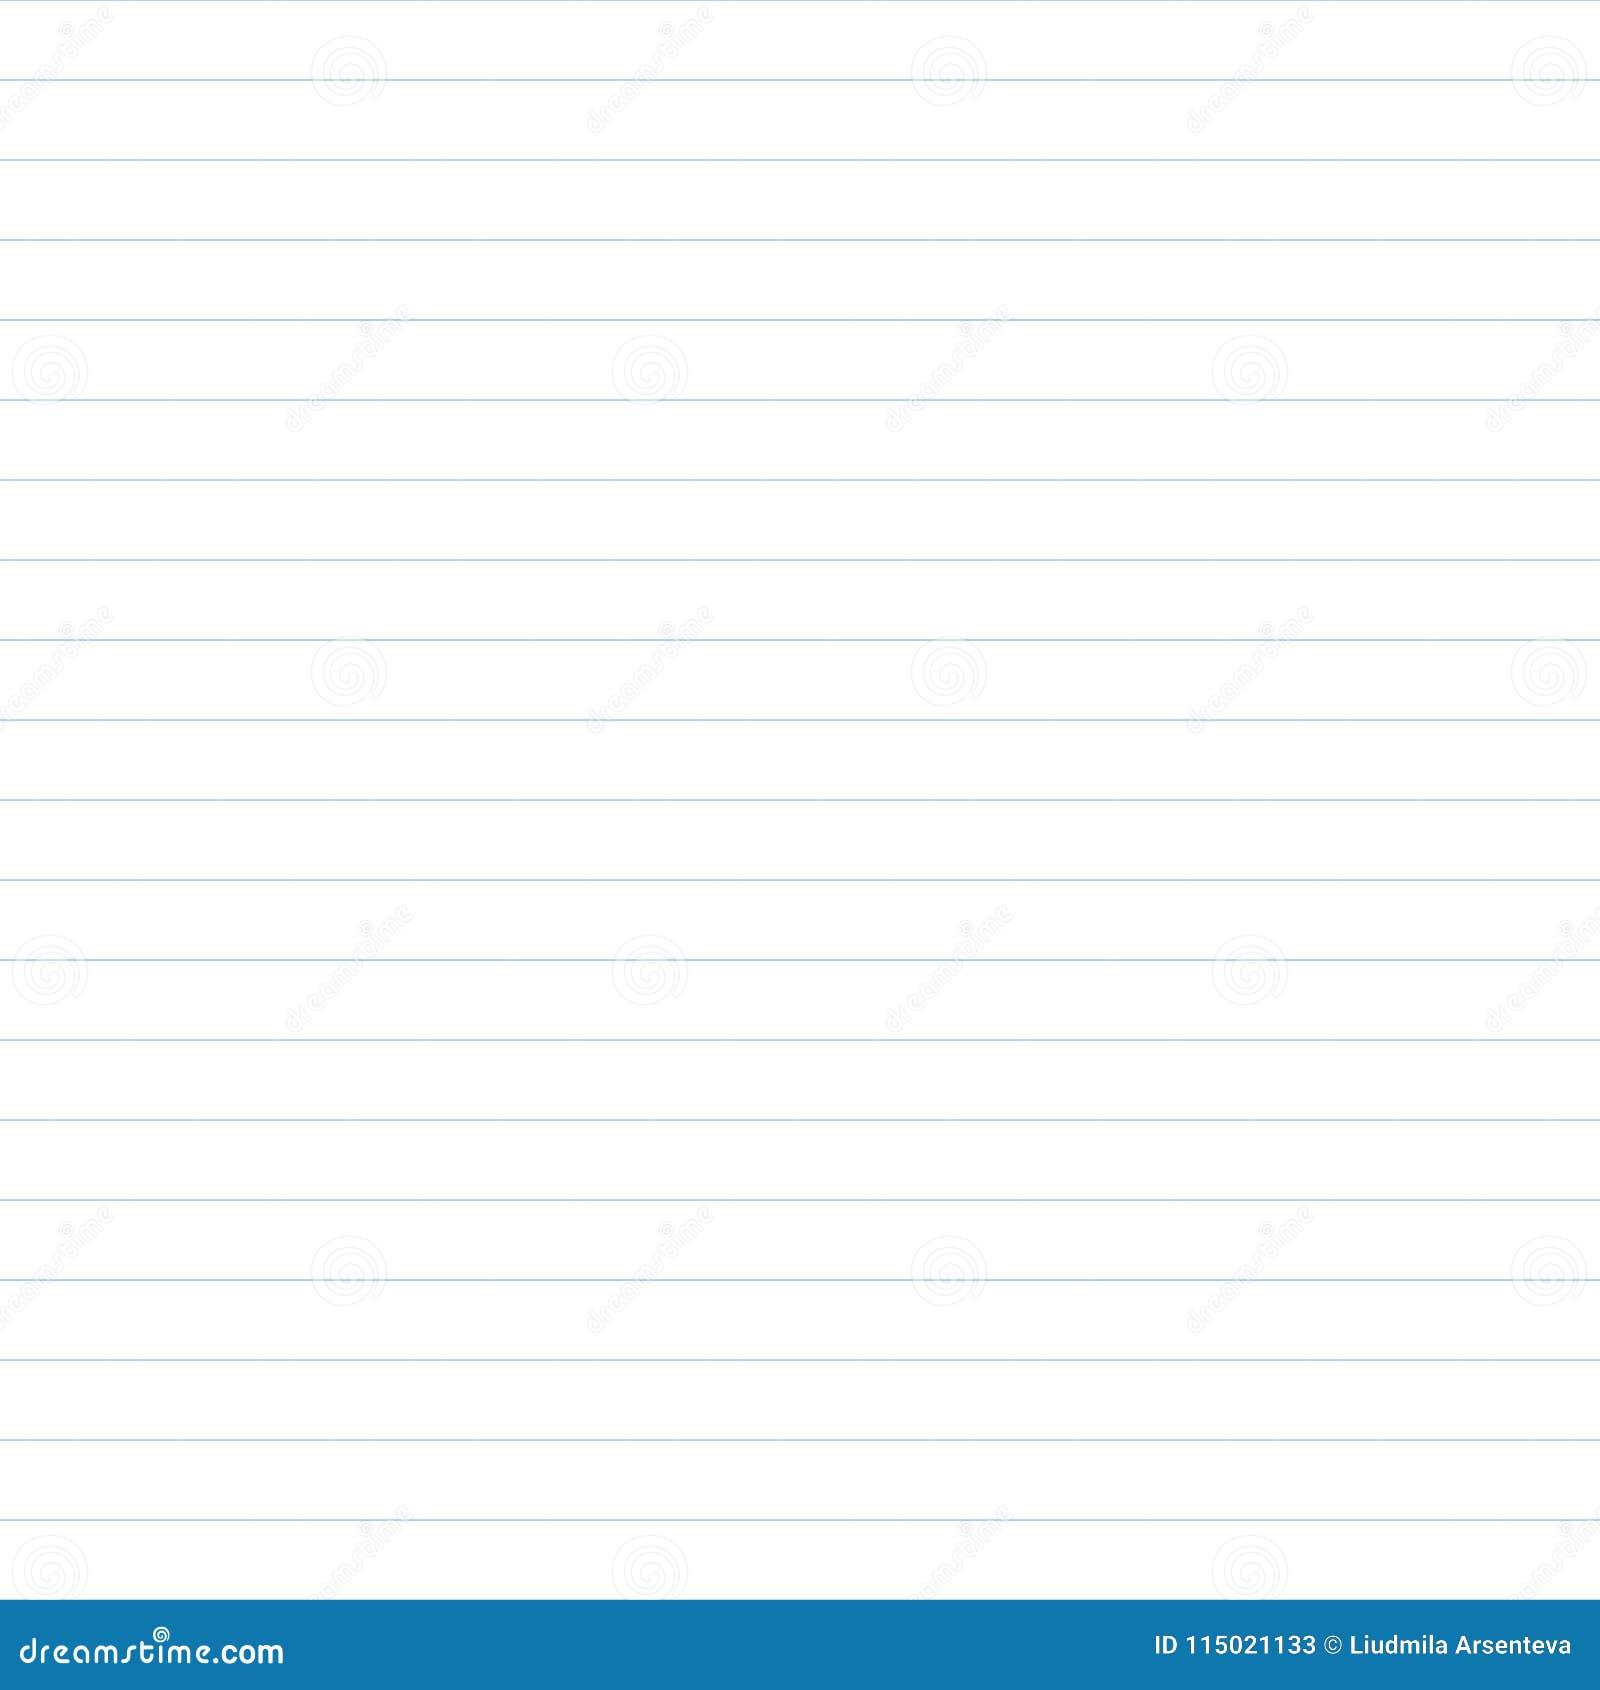 vector pattern of school copybook paper stock vector illustration